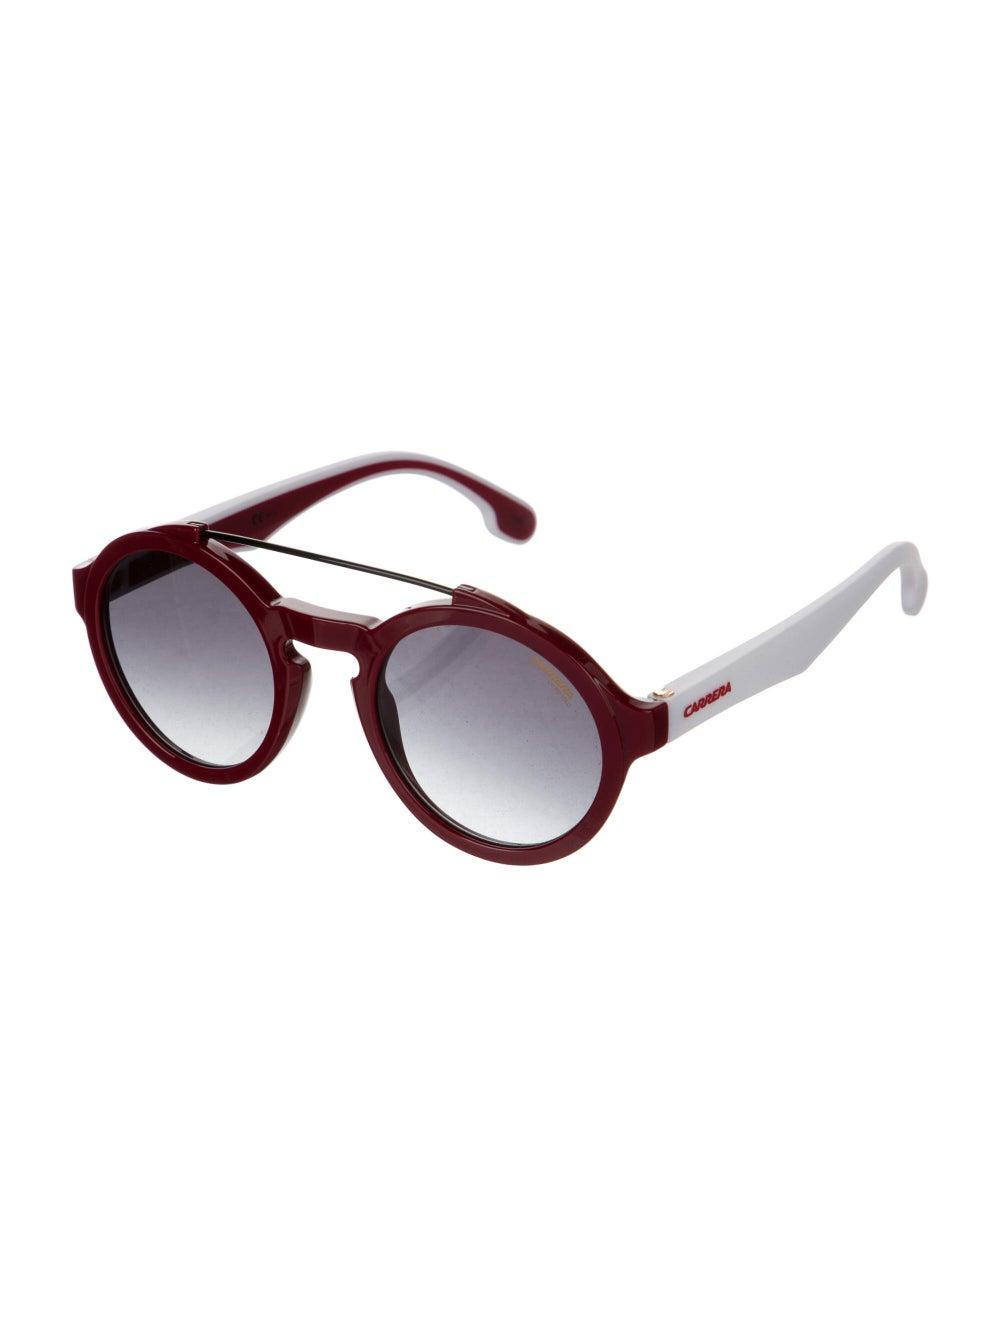 Carrera Round Gradient Round Sunglasses Red - image 2